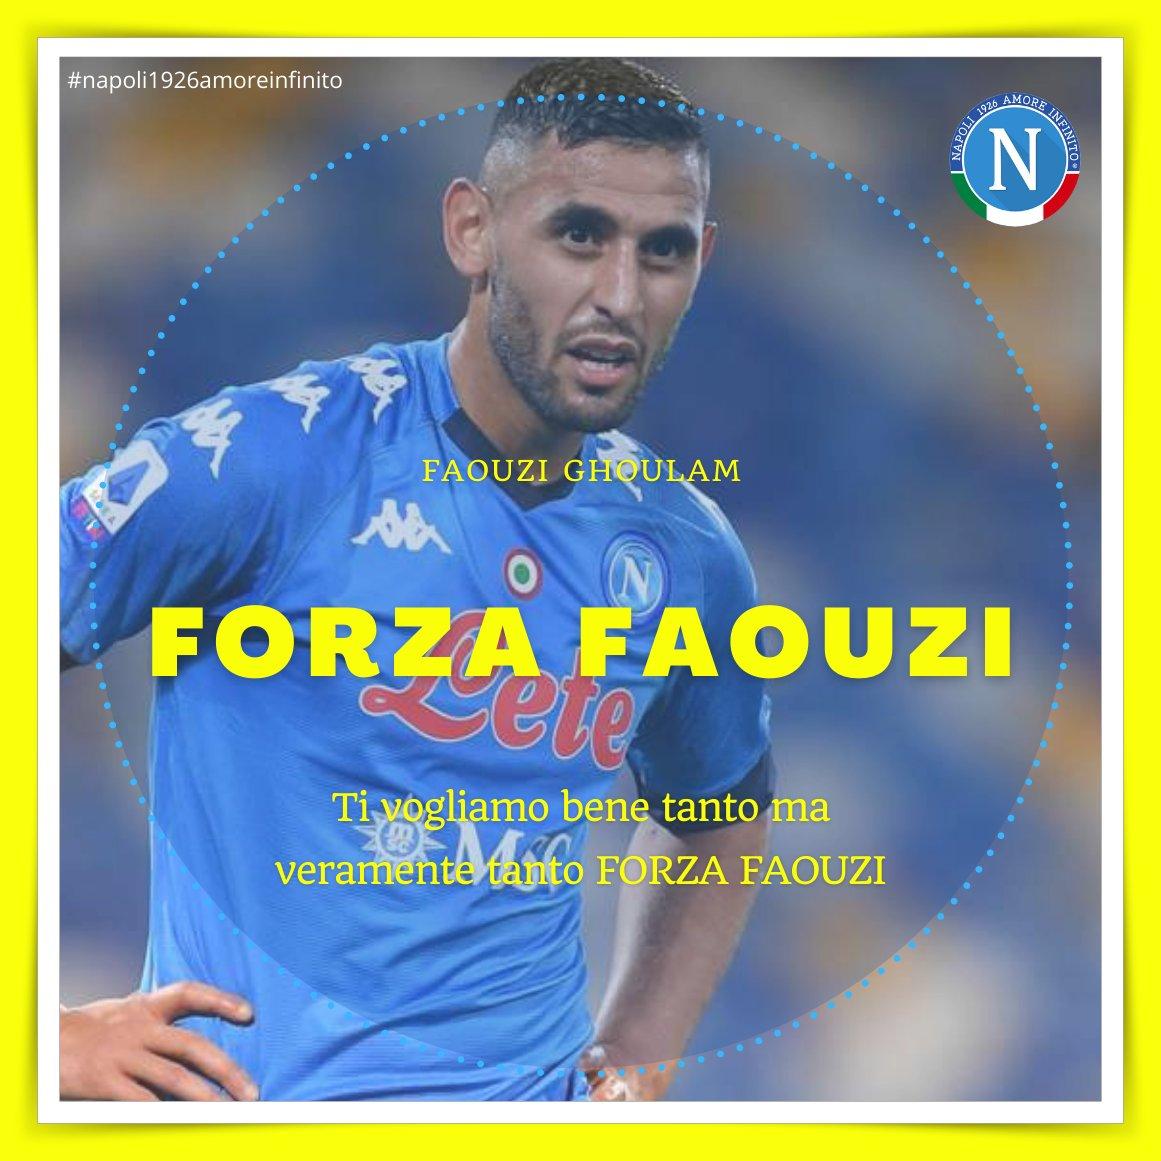 Forza Faouzi